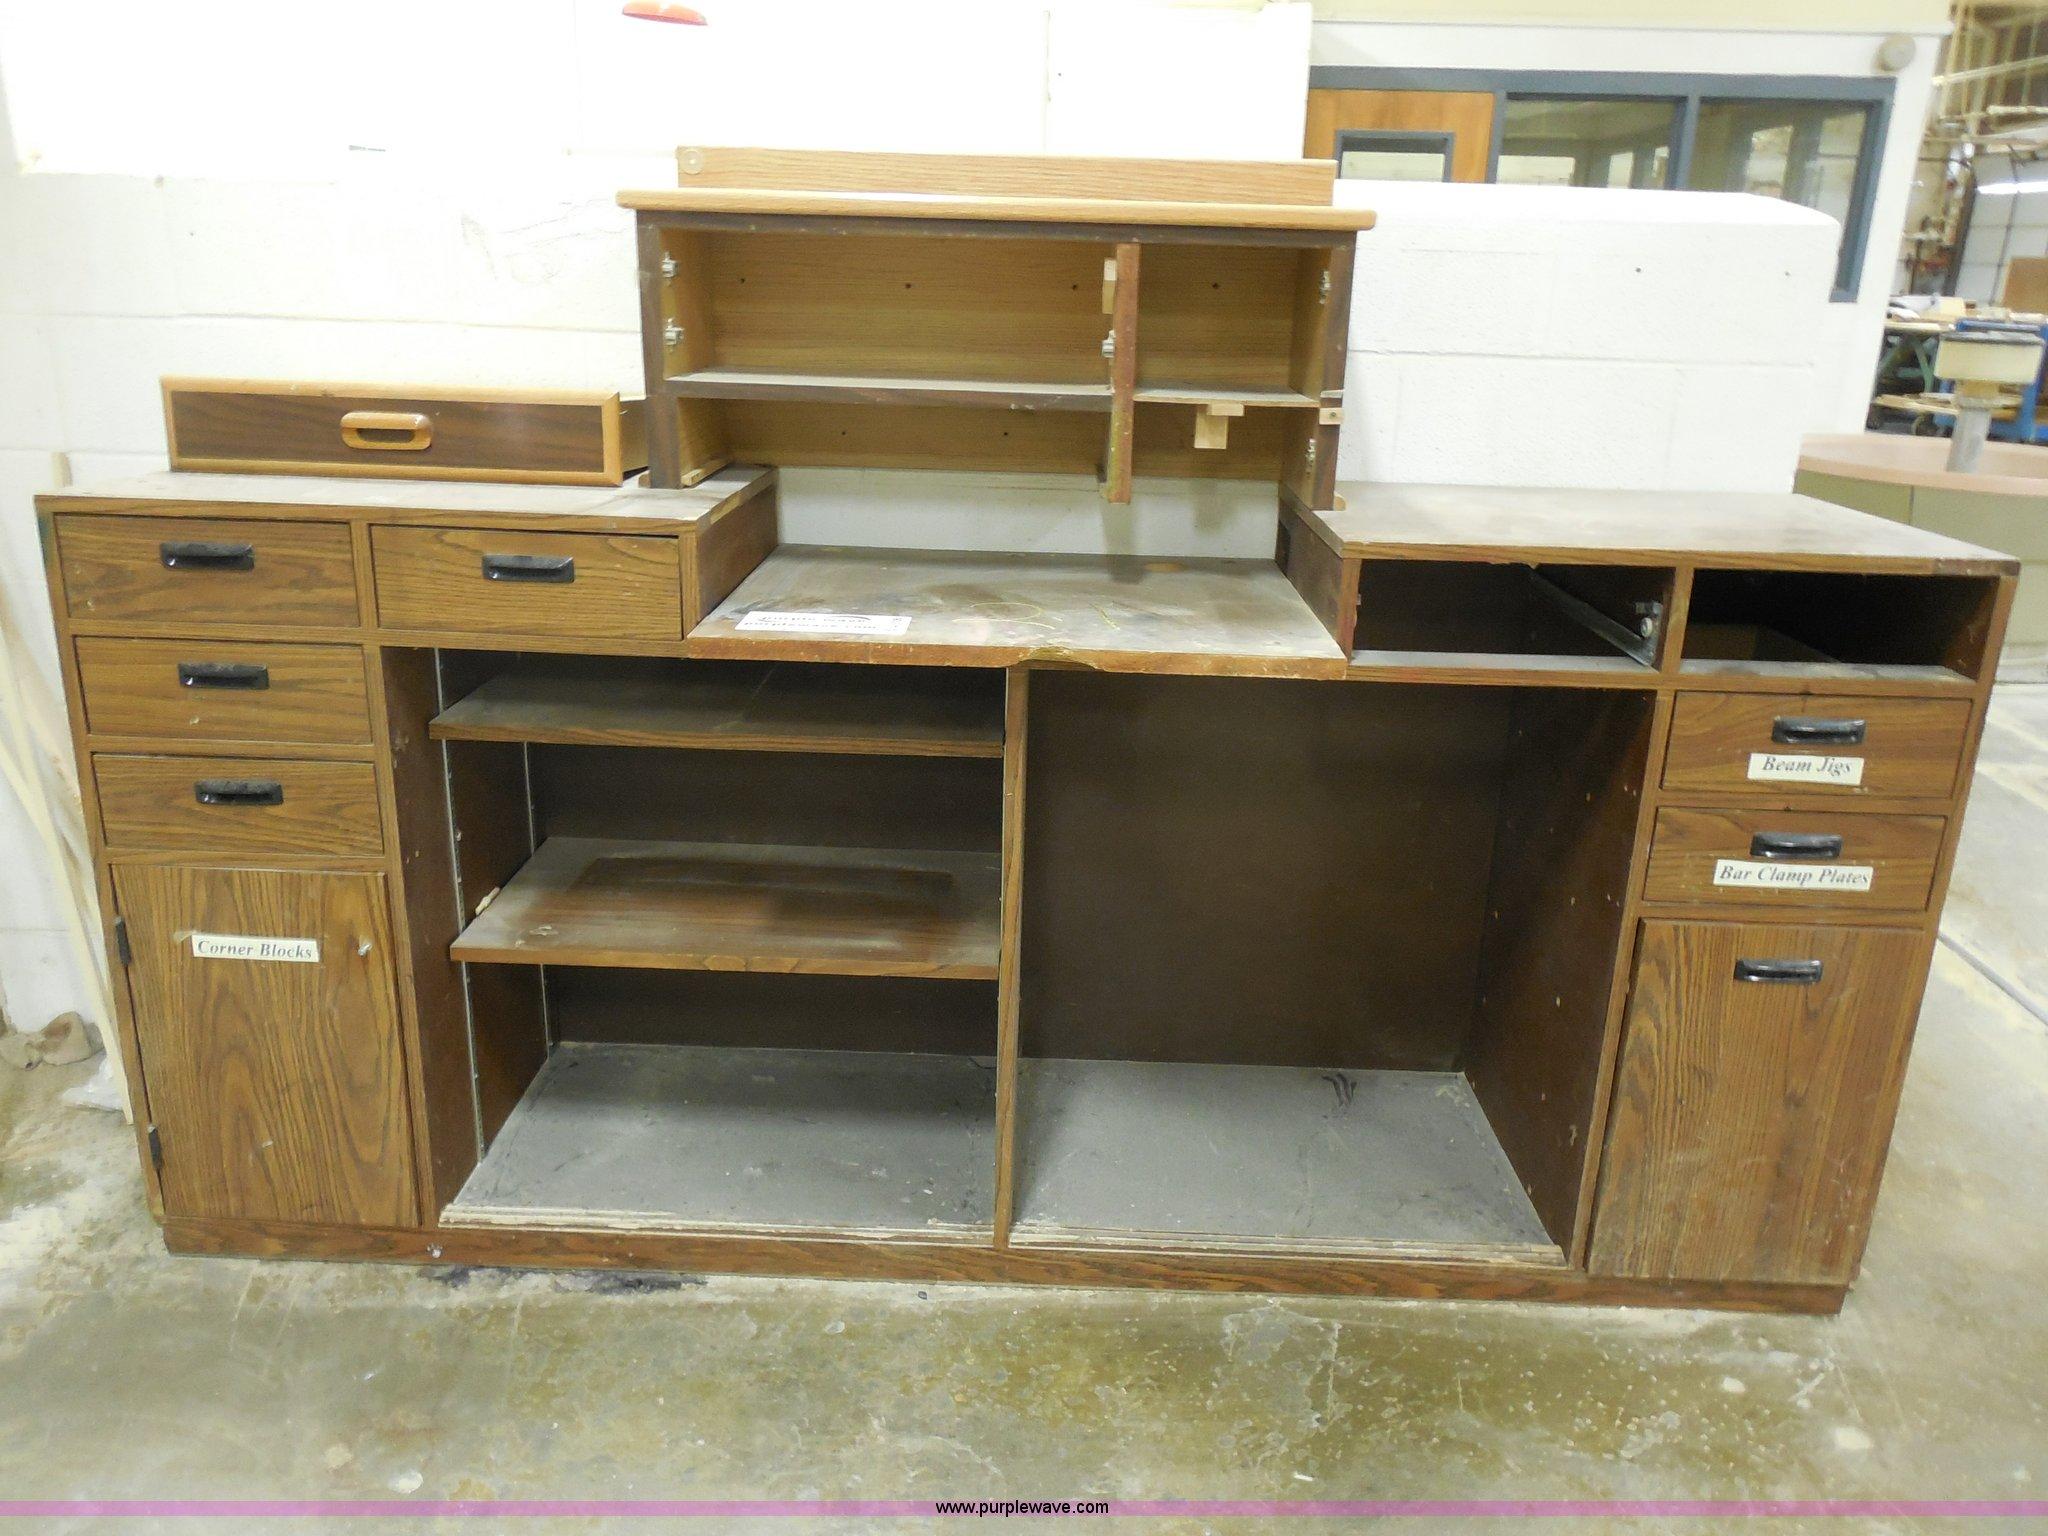 Terrific Work Bench Item A5106 Sold April 17 Midwest Auction P Beatyapartments Chair Design Images Beatyapartmentscom